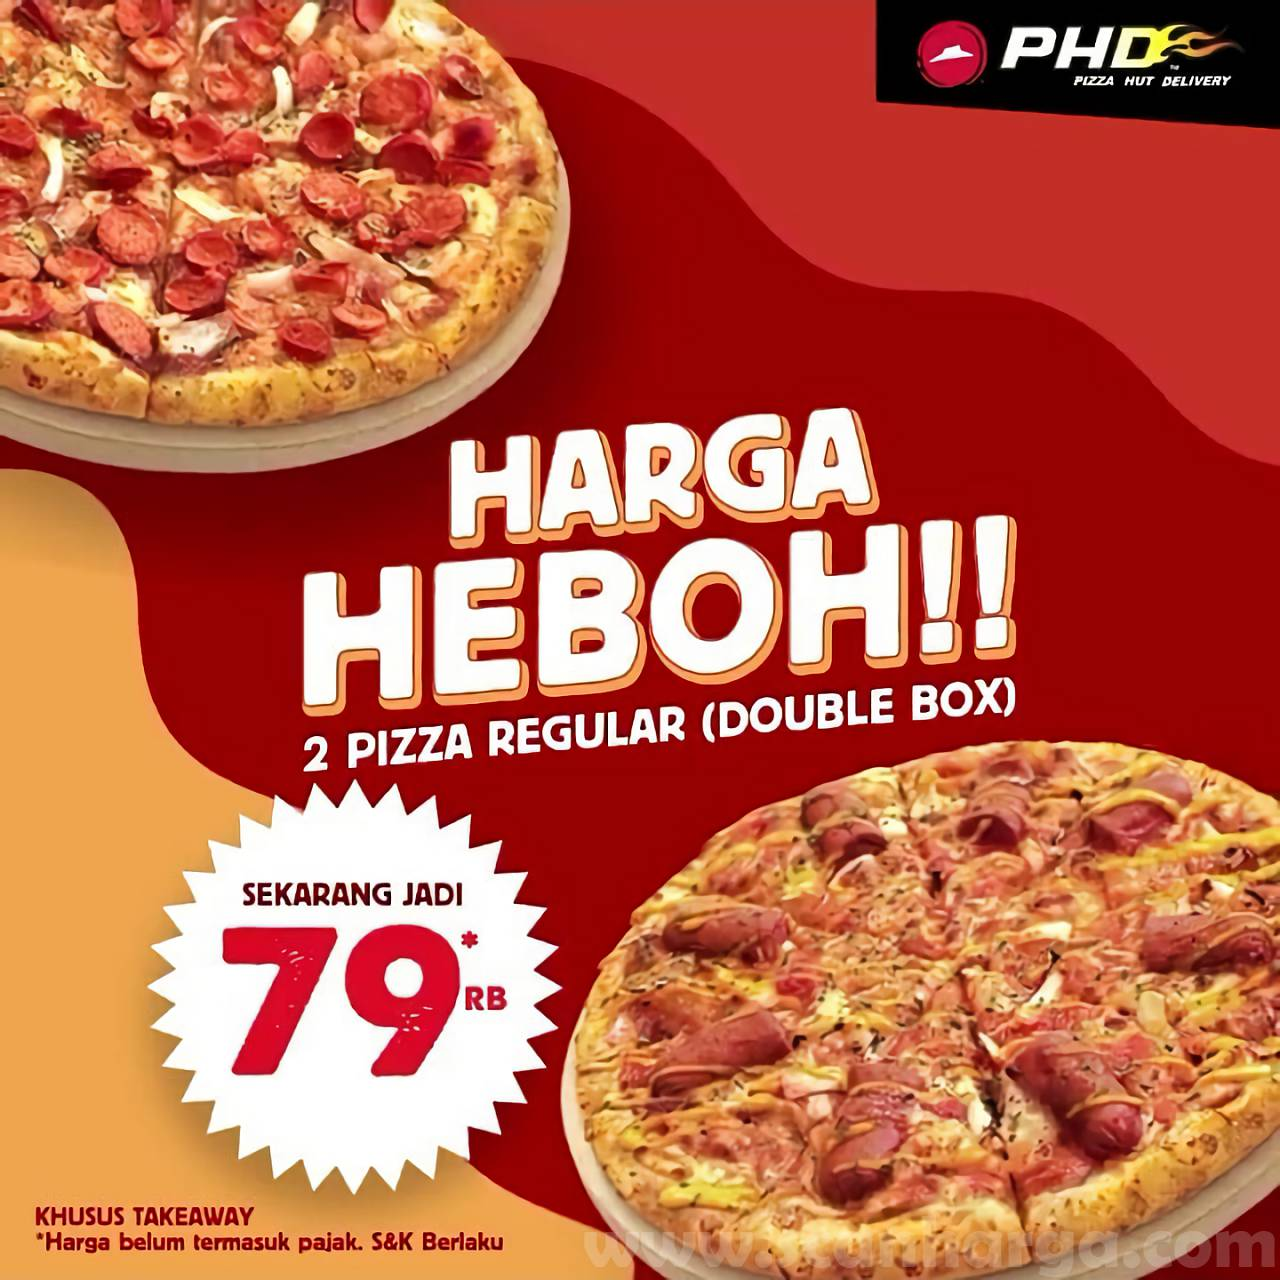 Promo PHD HARGA HEBOH 2 Pizza Reguler [Double Box] Sekarang Jadi 79 Ribu*